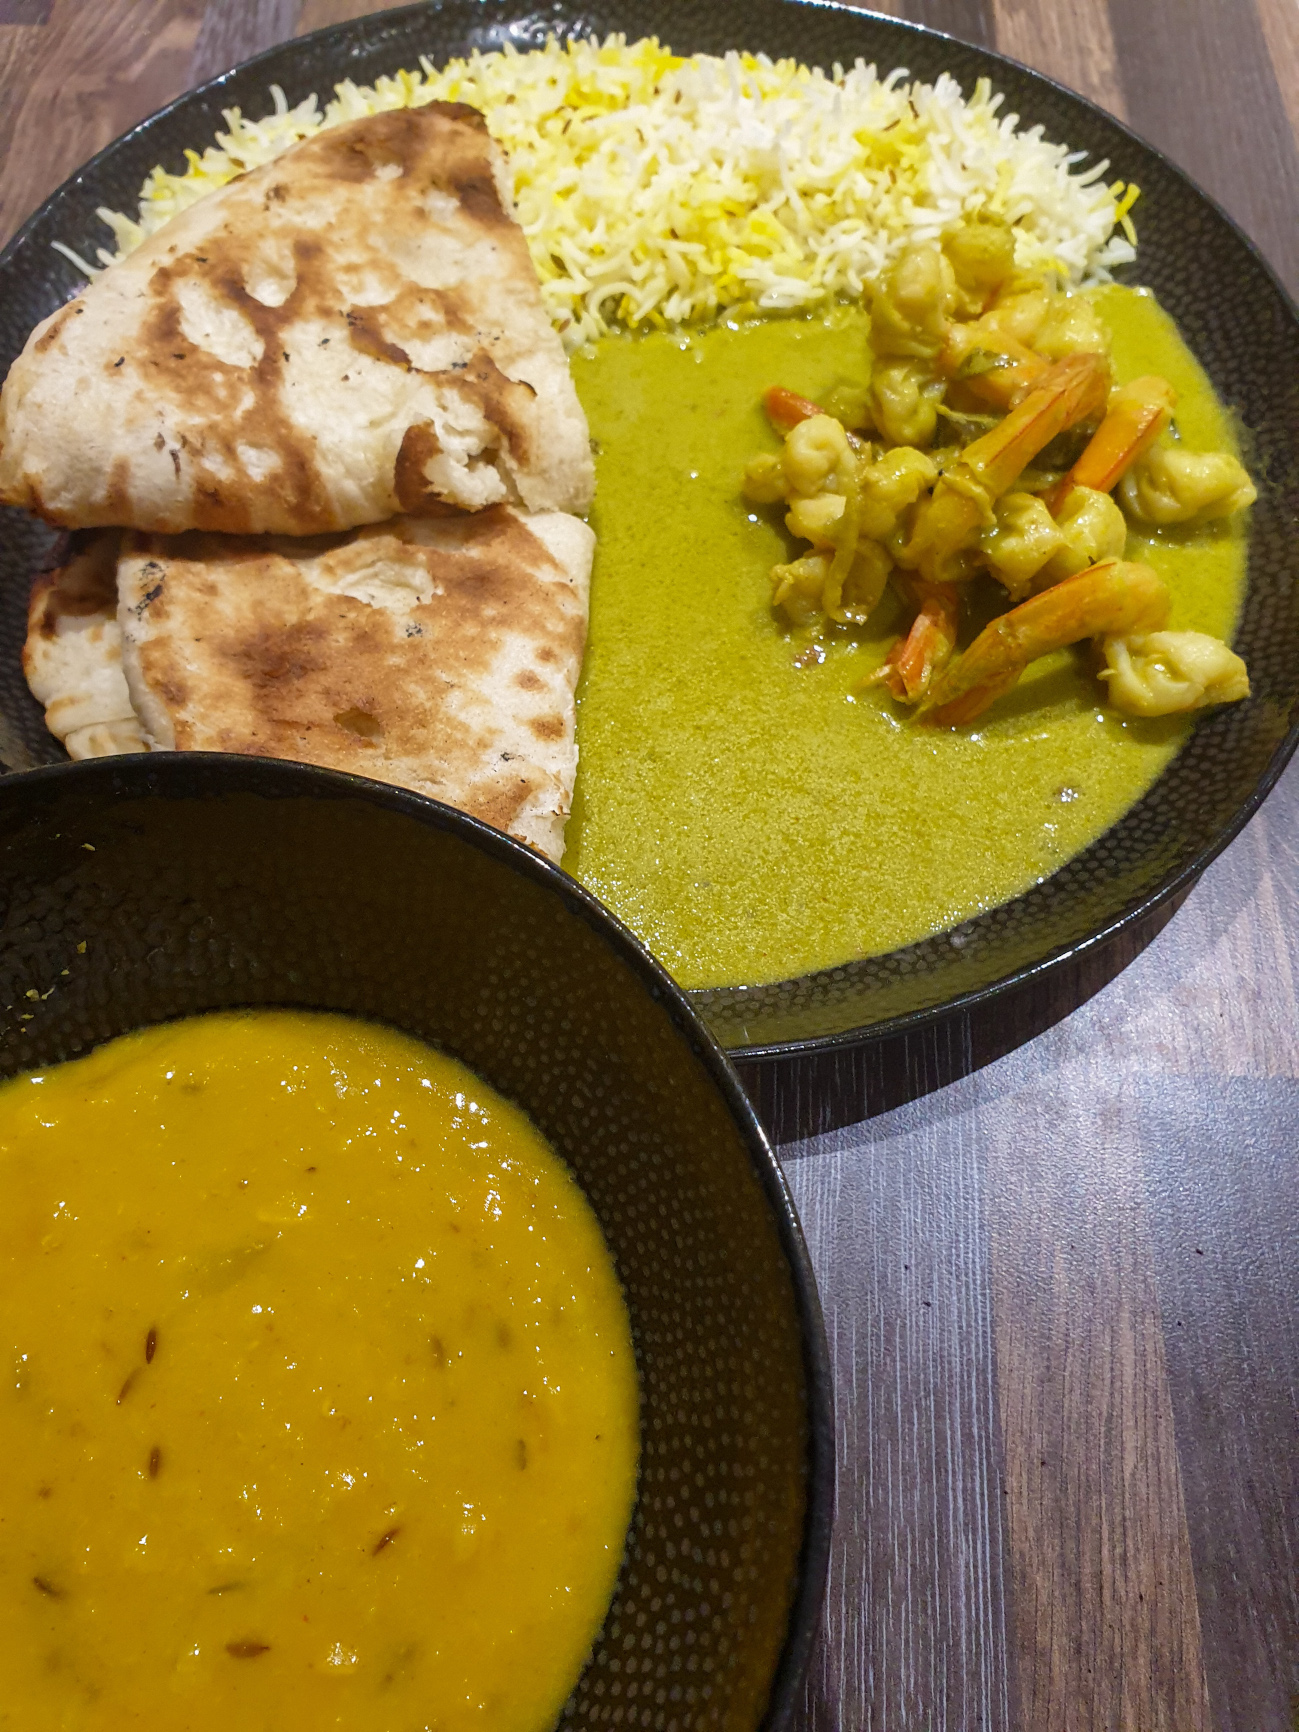 My Local Indian Kochi Prawn Curry and Dal Tadka